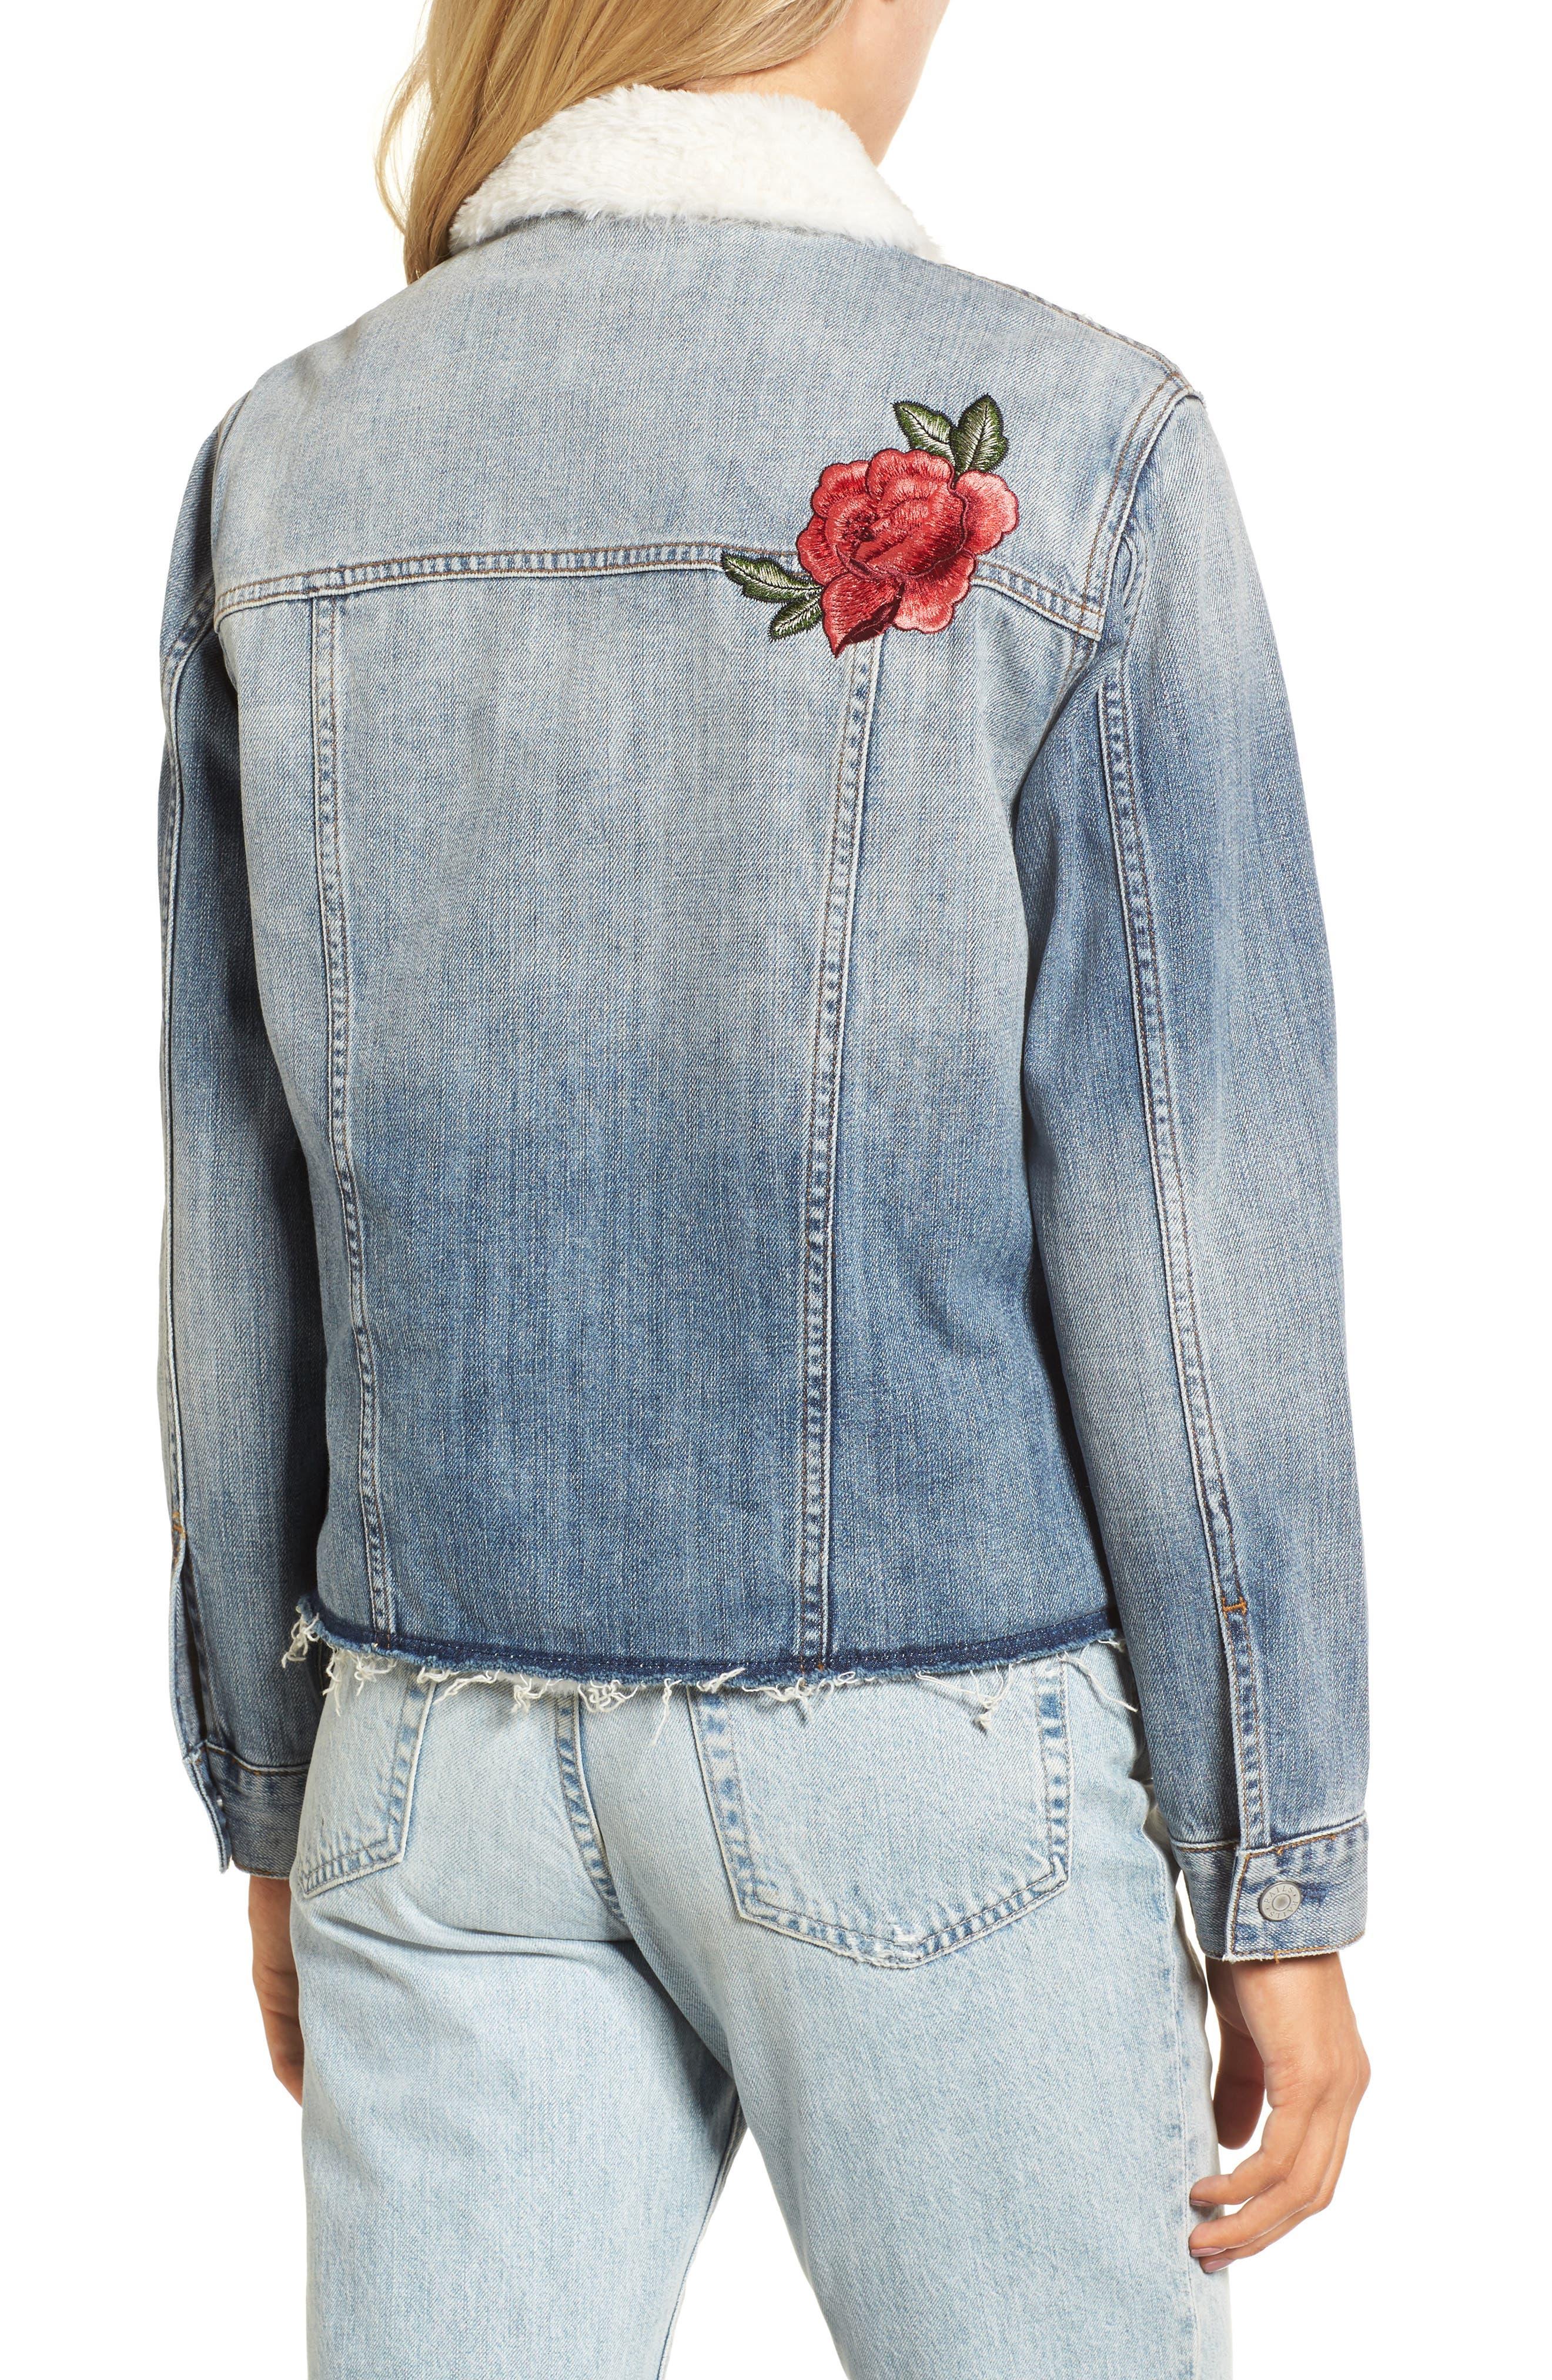 Alternate Image 2  - Rails Ramsey Embroidered Denim Jacket